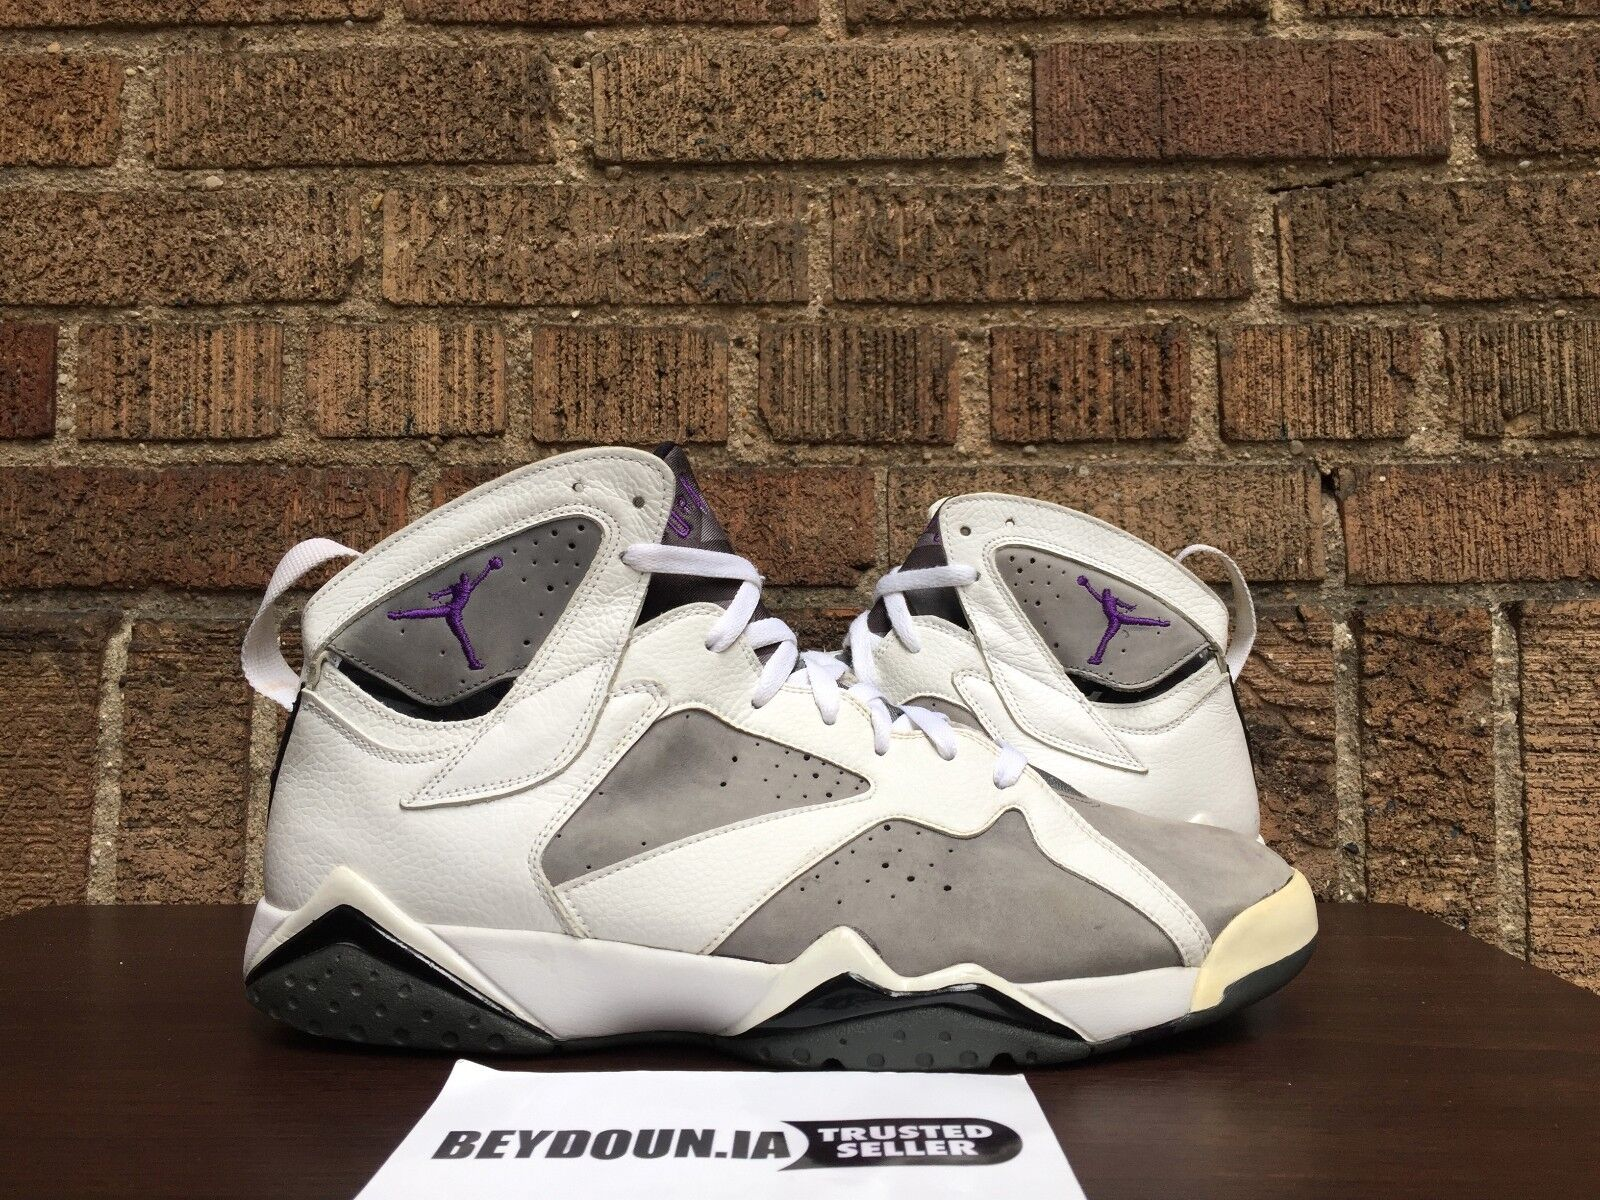 Nike Air Jordan VII 7 Retro Flint Grey Mens Size 13 304775-151